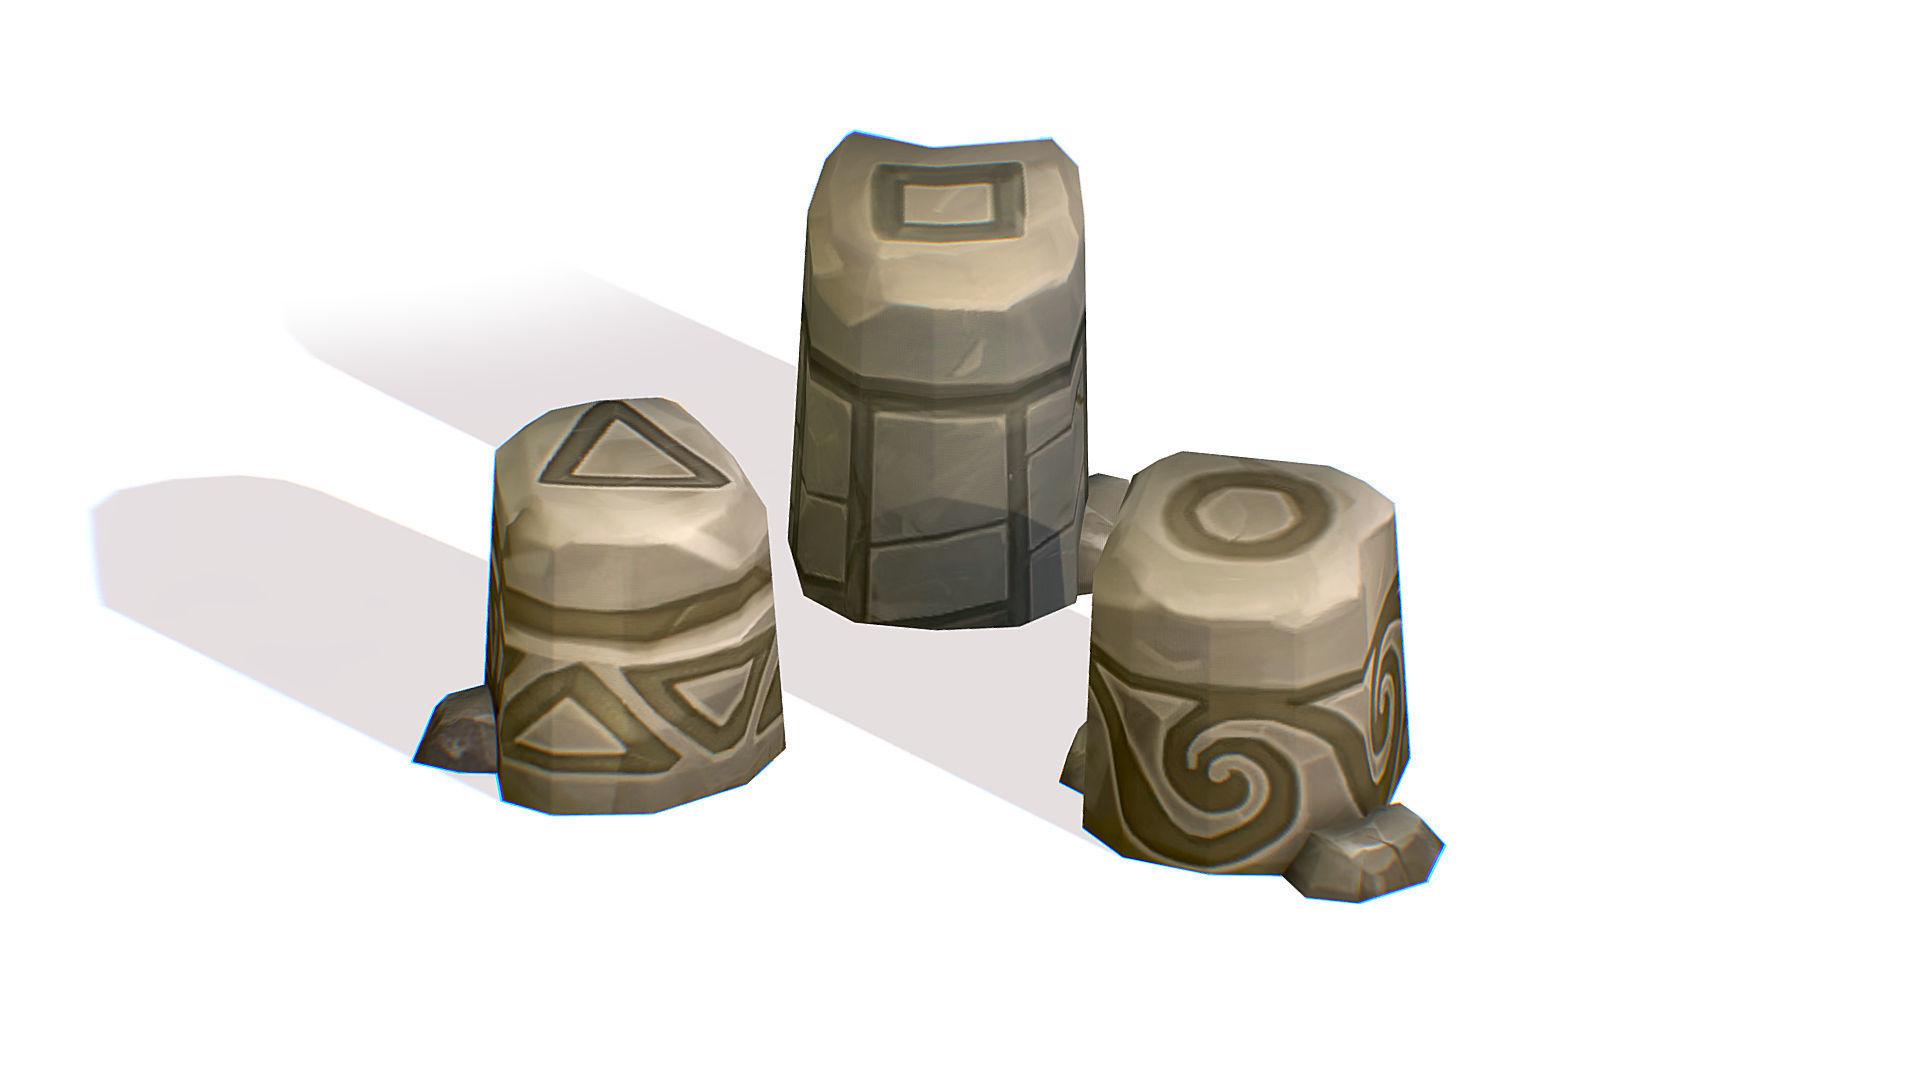 Handpaint Cartoon Stone Memorial Totem Symbol